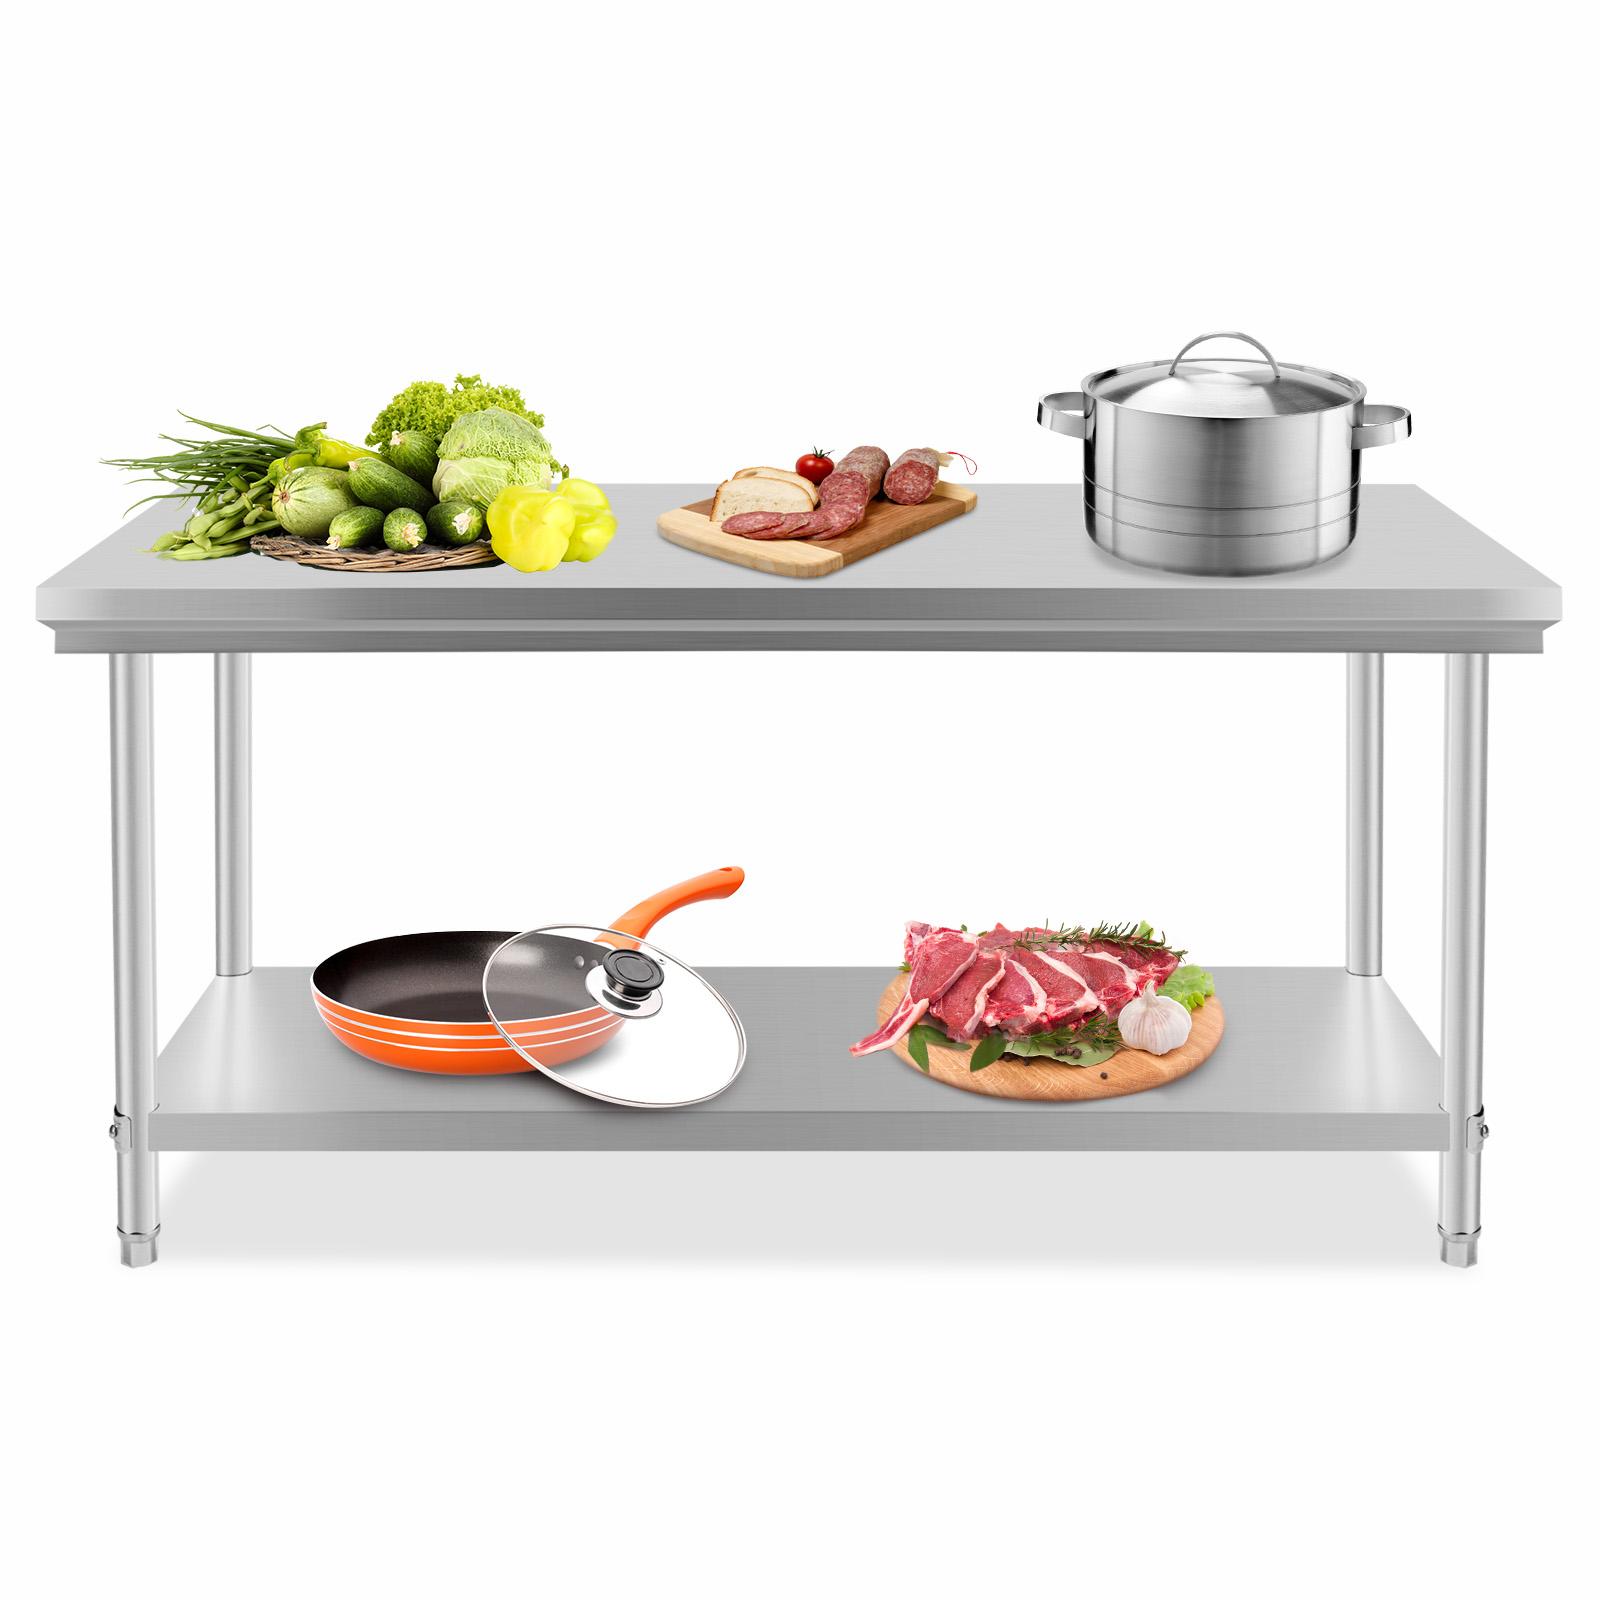 Restaurant stainless steel kitchen work prep table nsf chef shelf com - Jns03 Maple Prep Table Restaurant Equipment For Your Home Kitchen